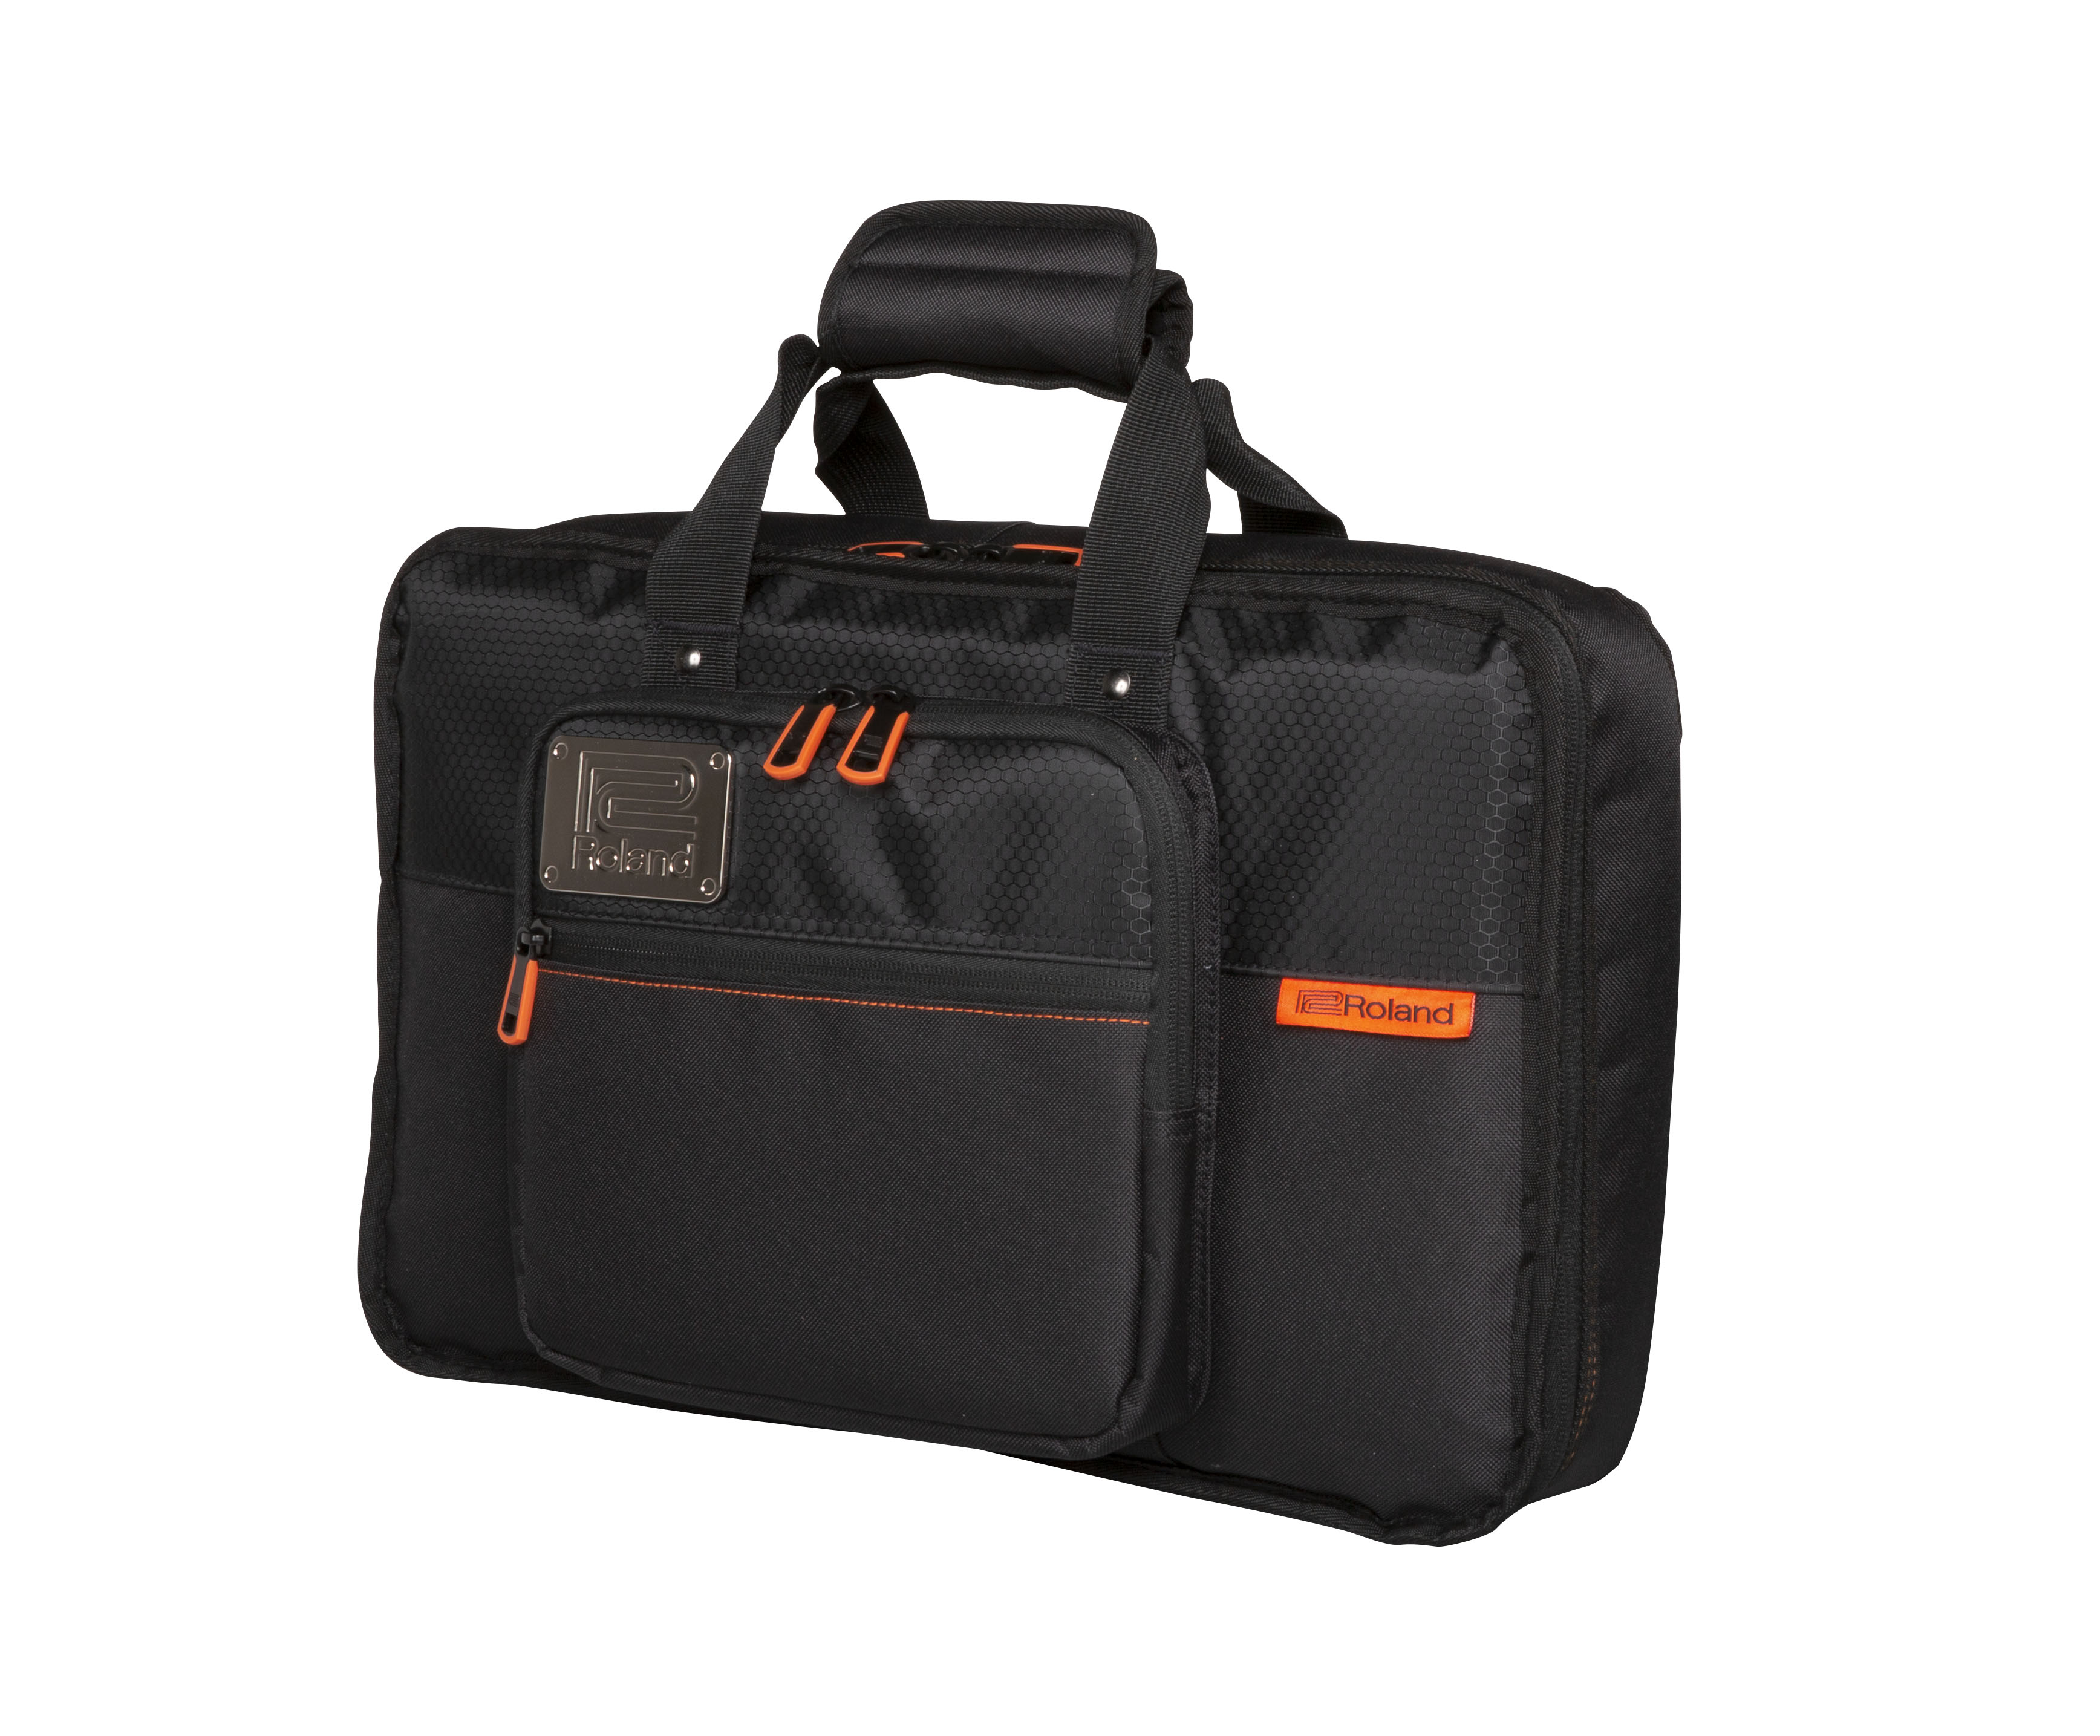 Roland CB-BTRMX Black Series Bag für die TR-8S/TR-8 Rhythm Performer and MX-1 Mix Performer 242352